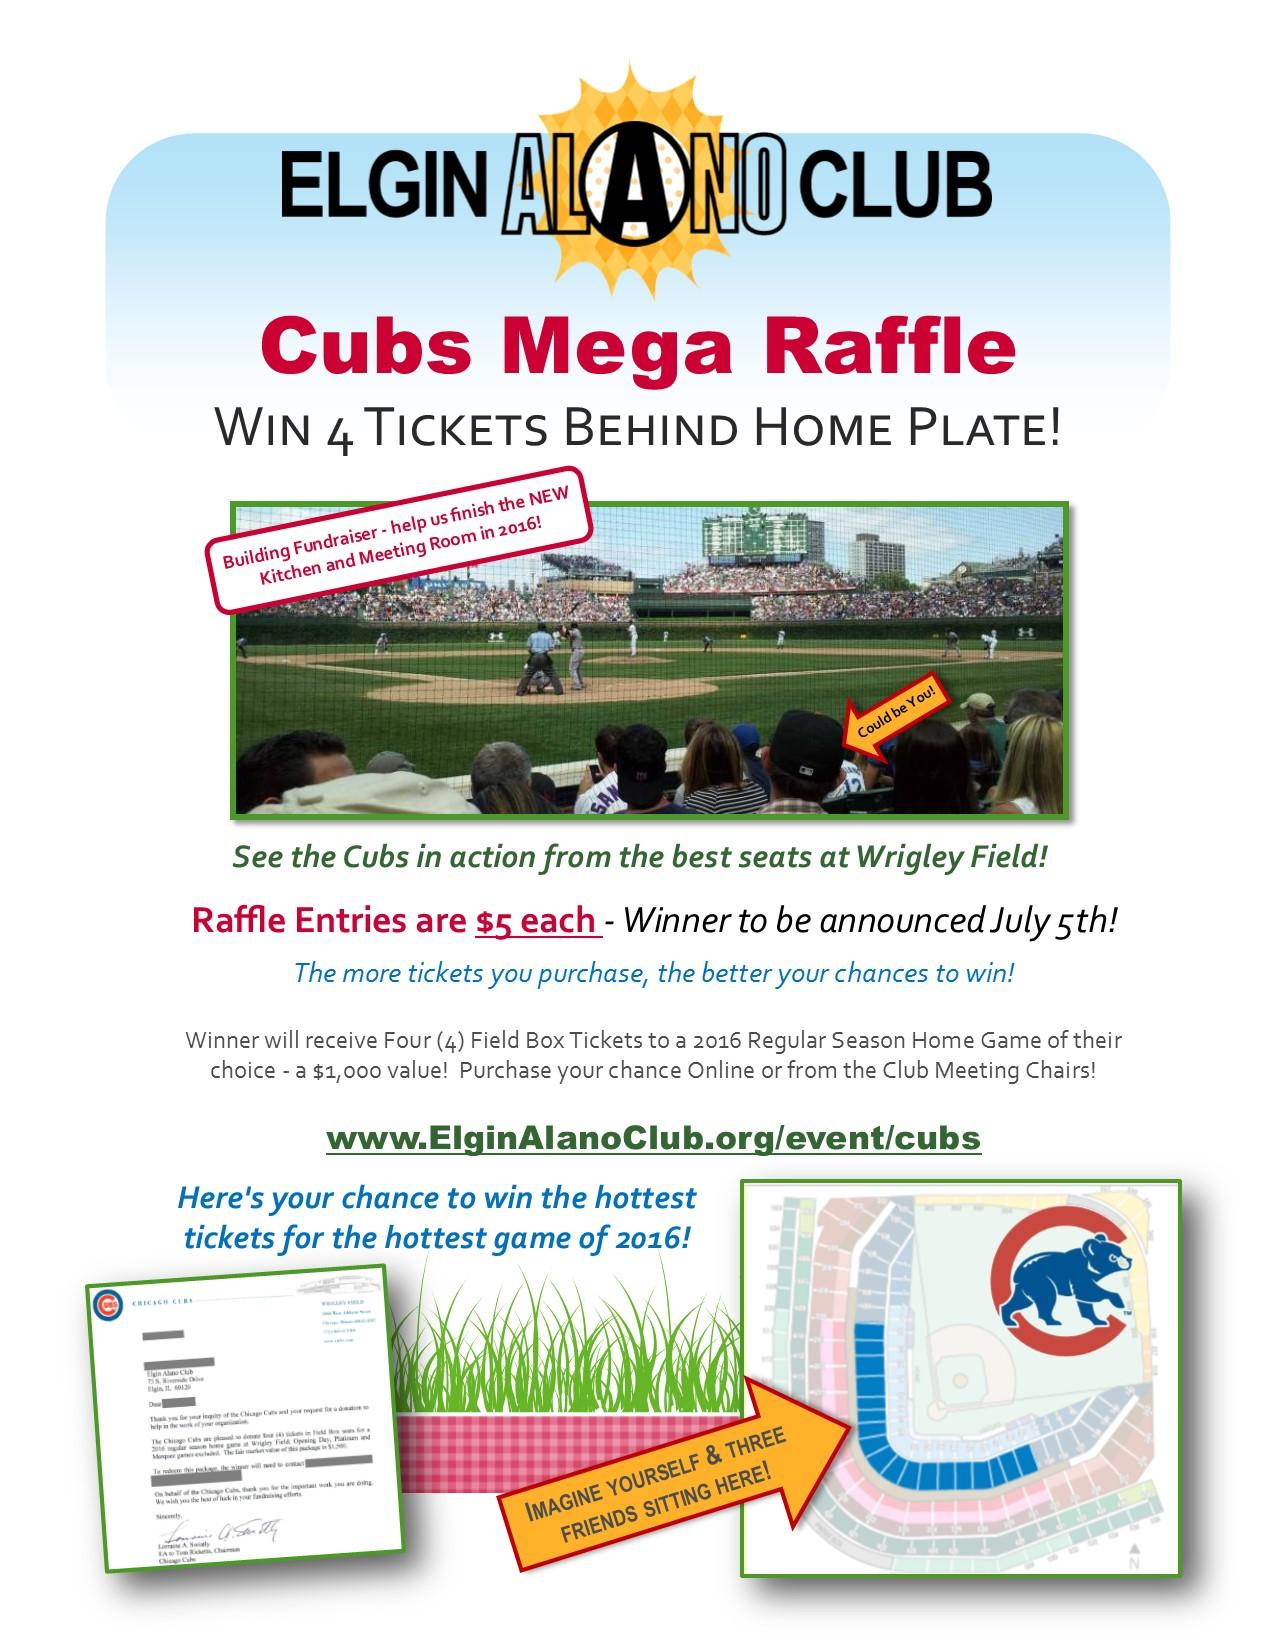 Building Fundraiser - Cubs Tickets Mega Raffle 1